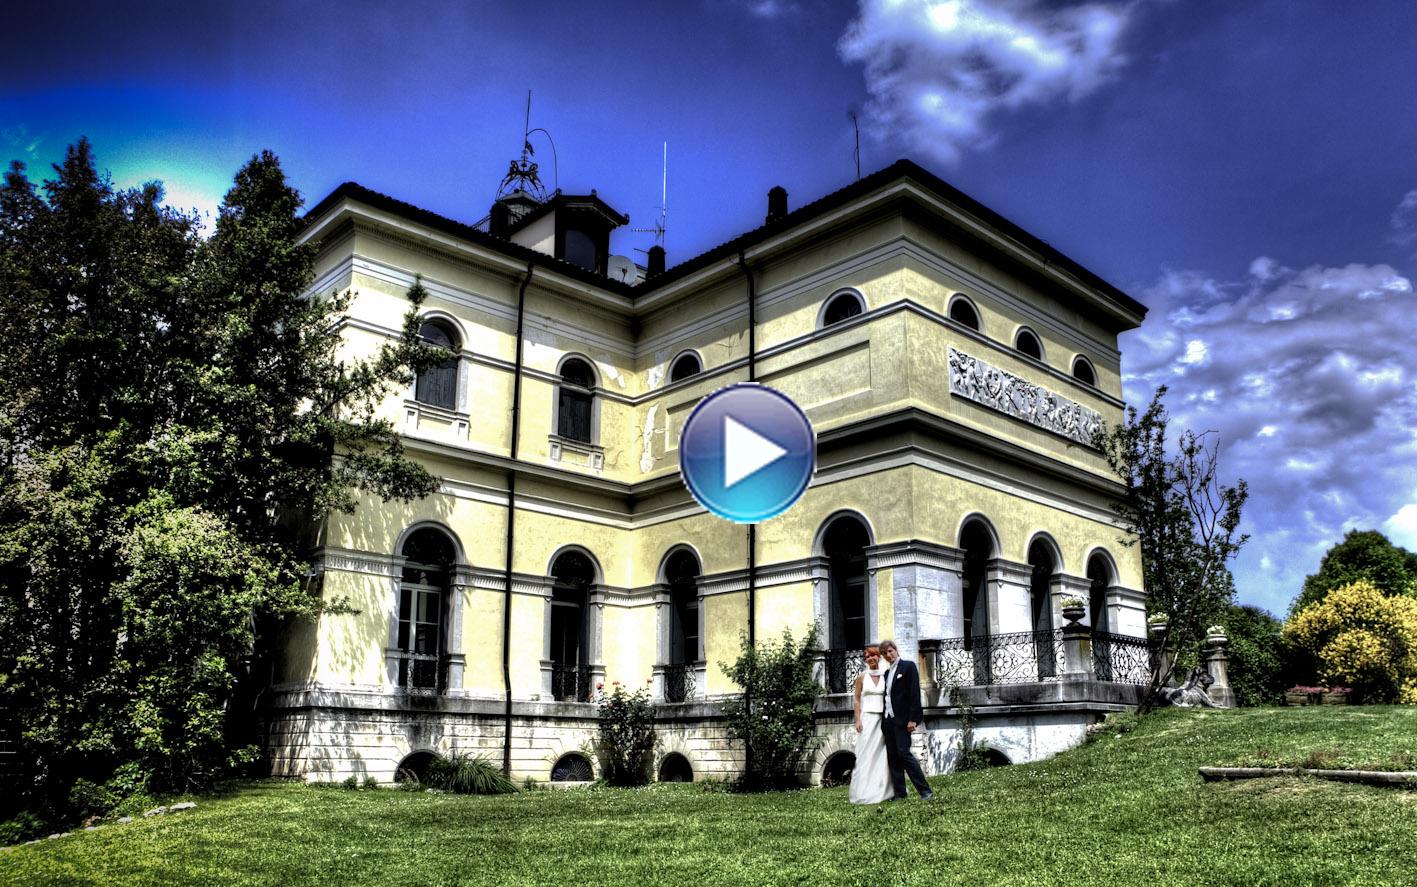 fotografo Udine Friuli